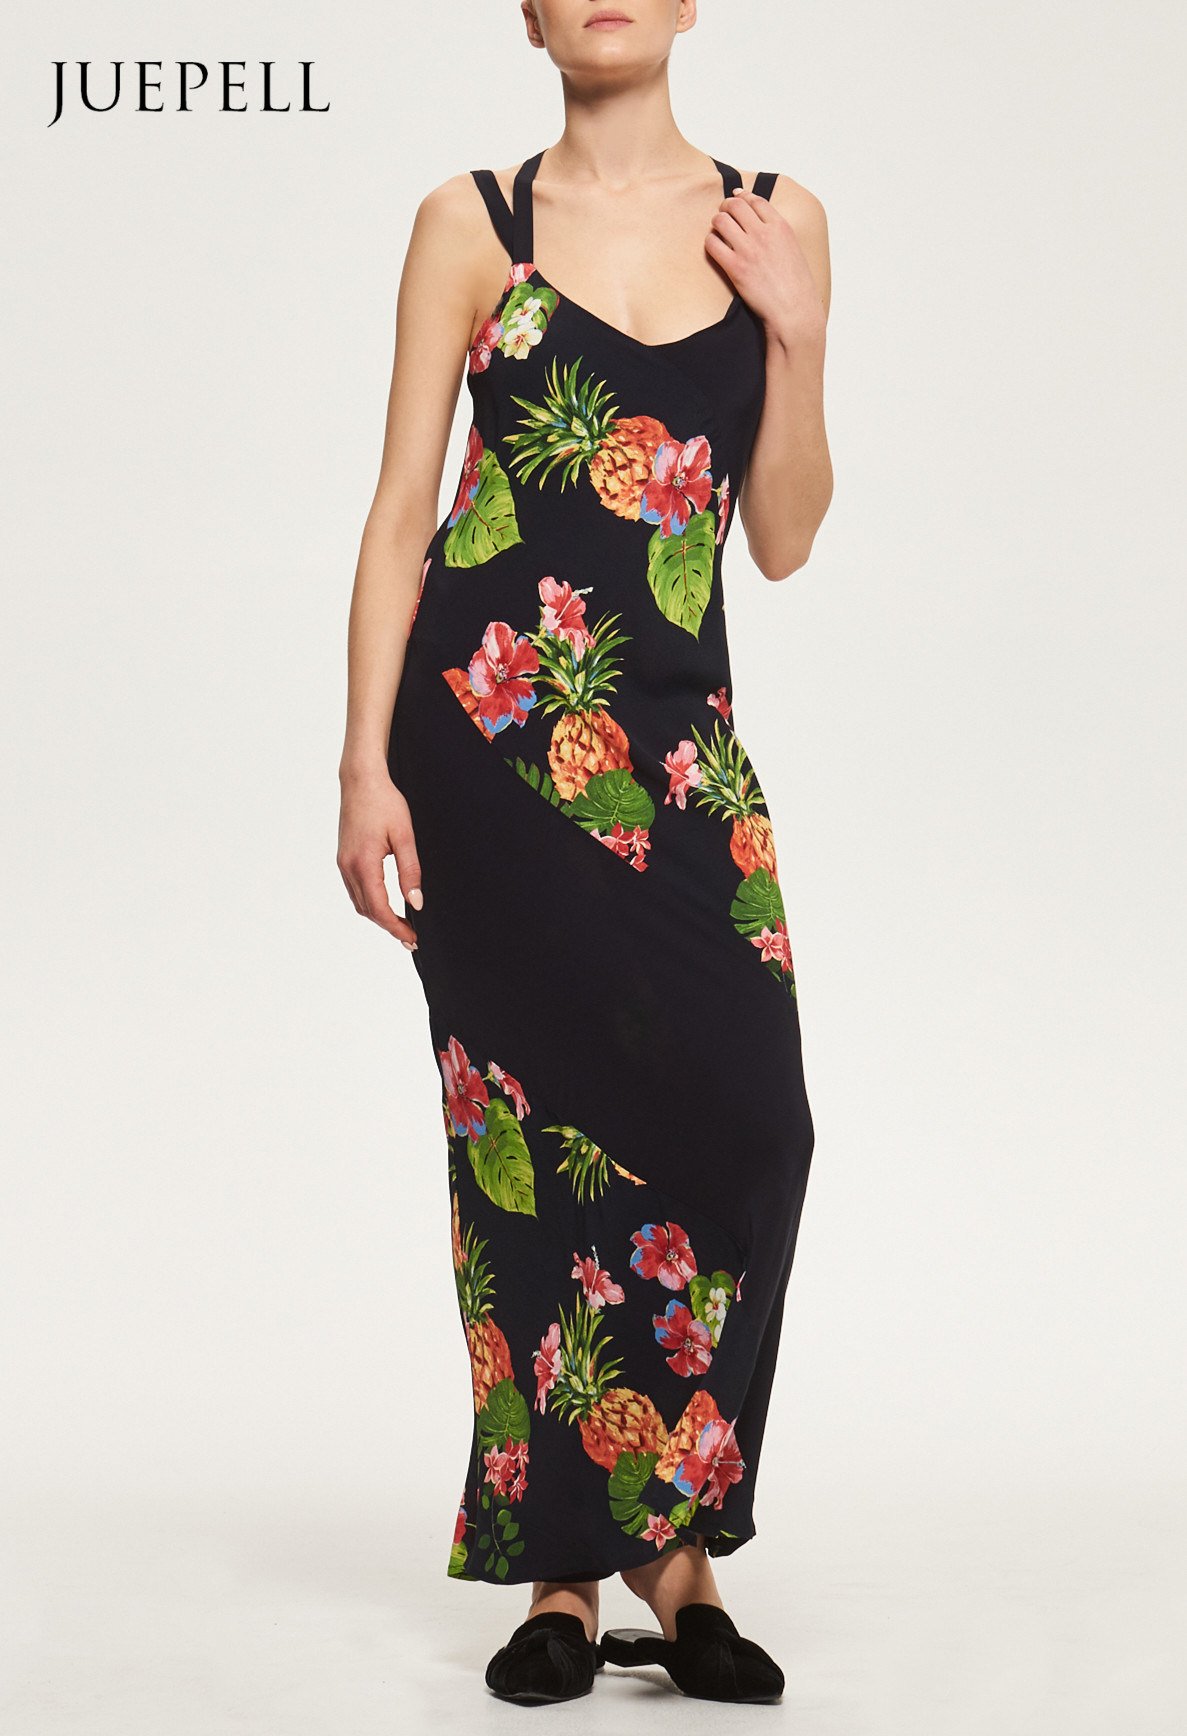 Floral Print Tropical Halterneck Beach Dress